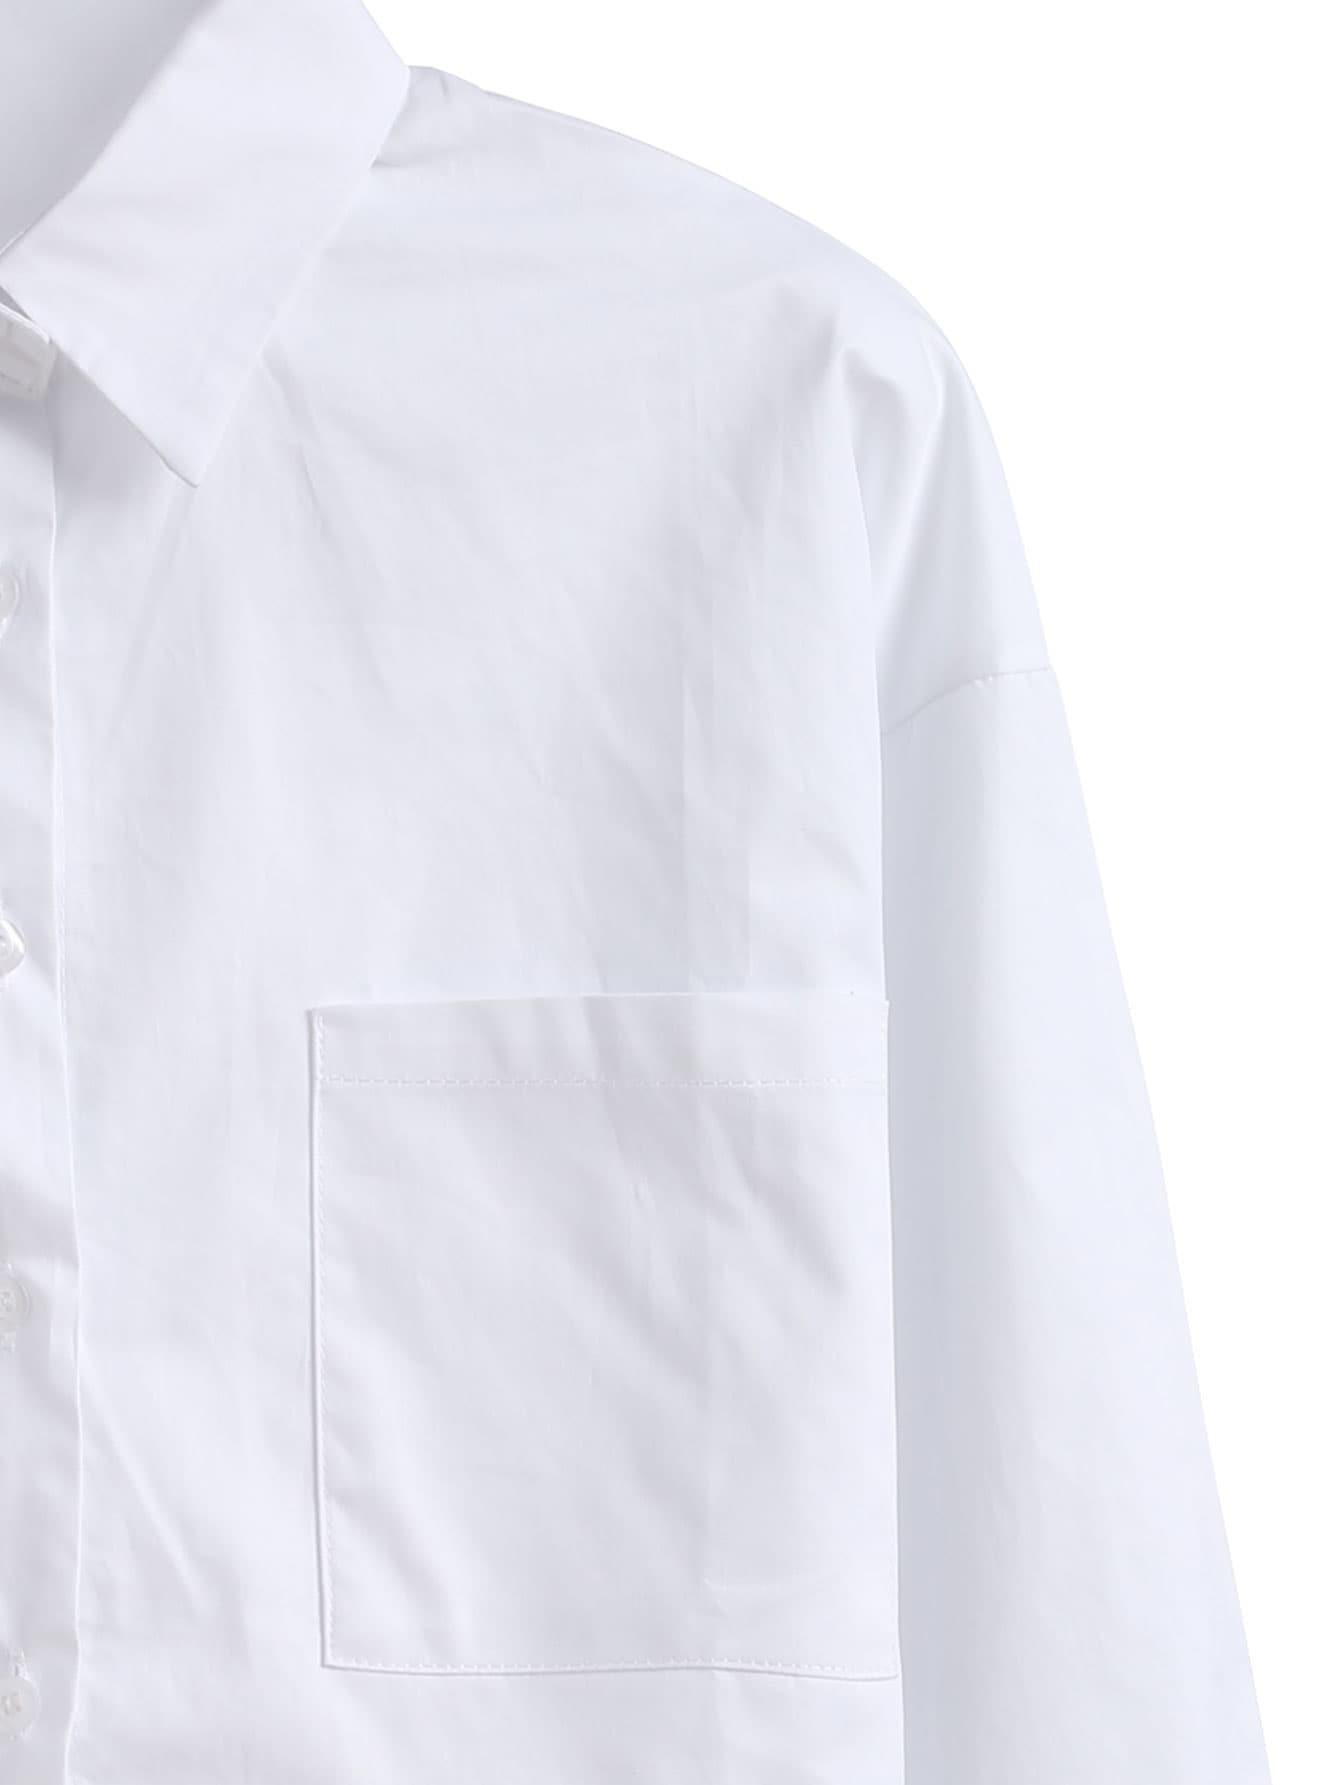 blouse160830121_2